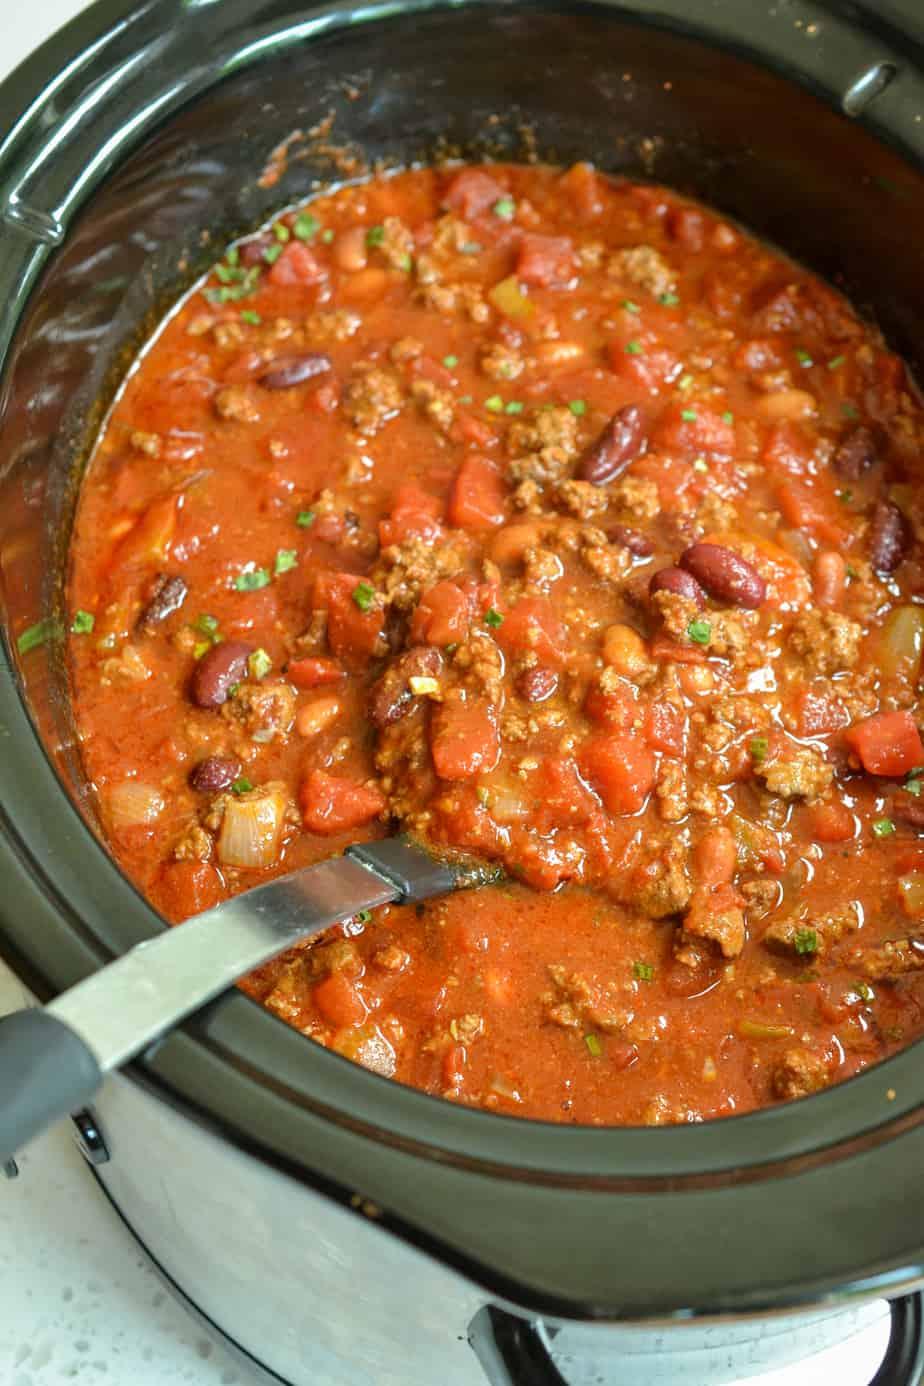 A large ladle full of chili.